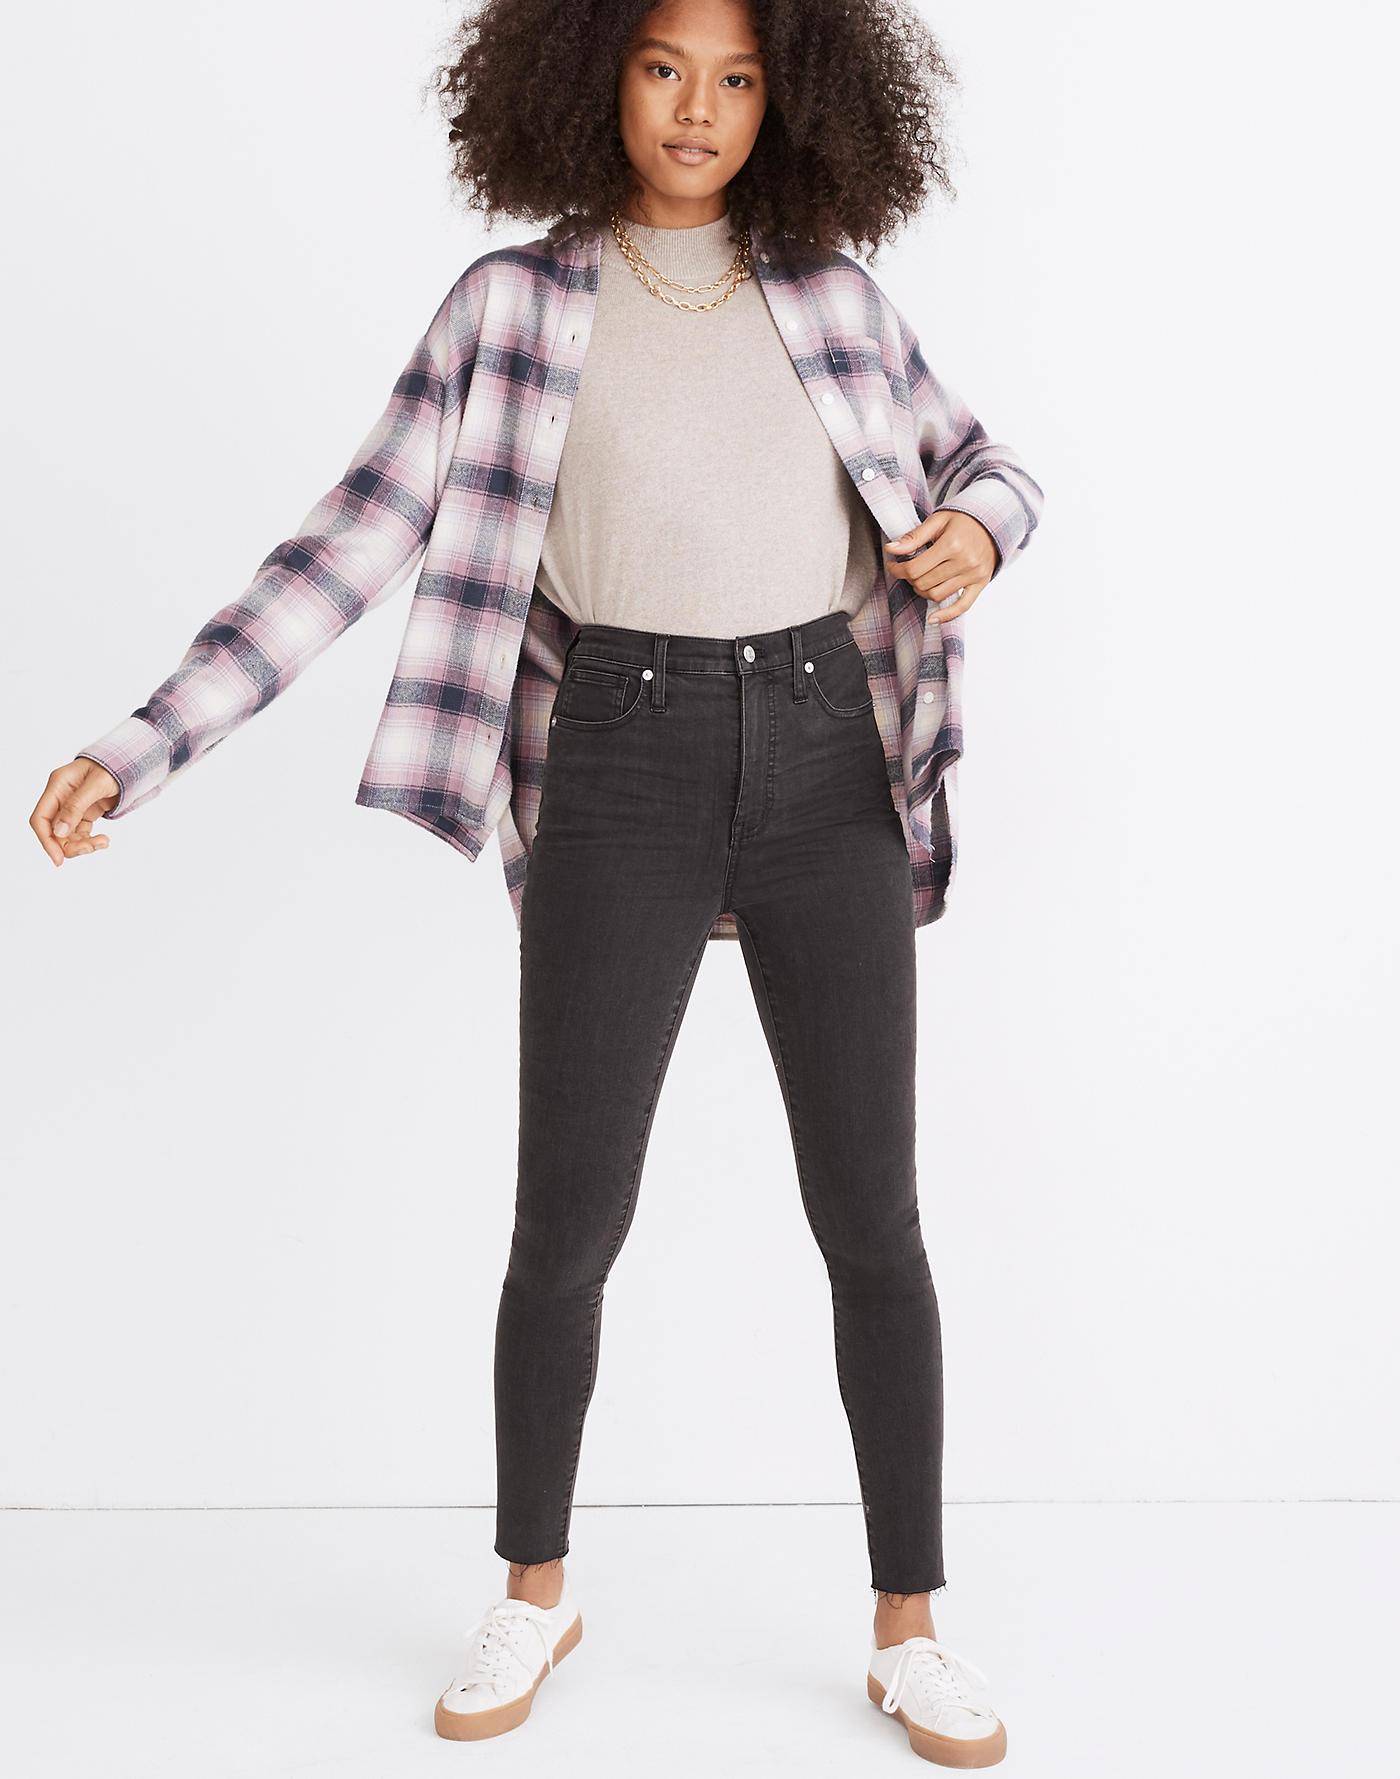 Madewell jeans on sale